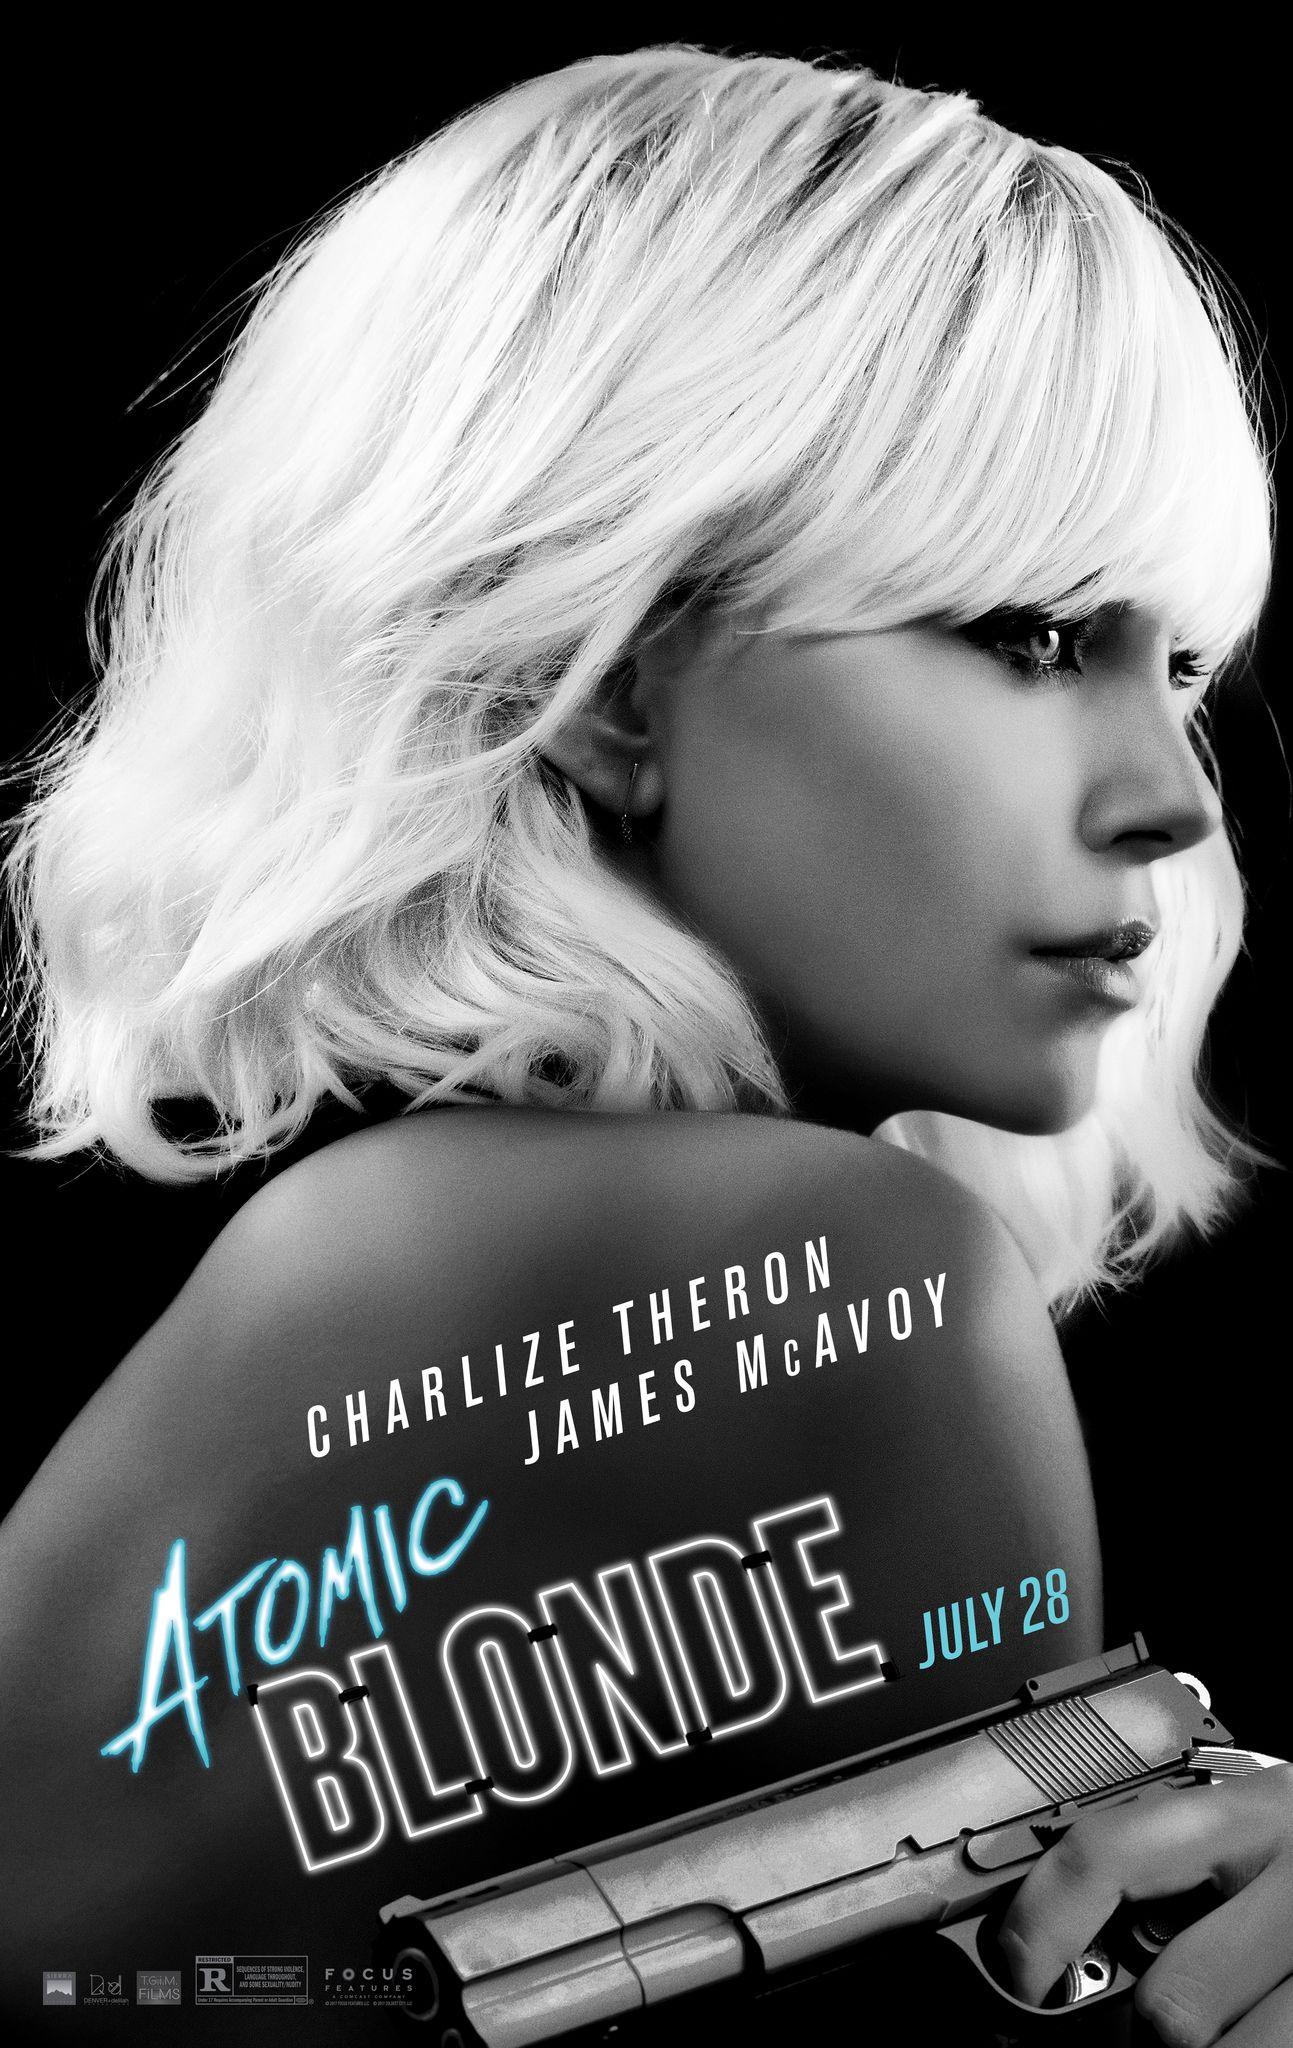 Watch Movie Atomic Blonde Full Hd Teslamovies